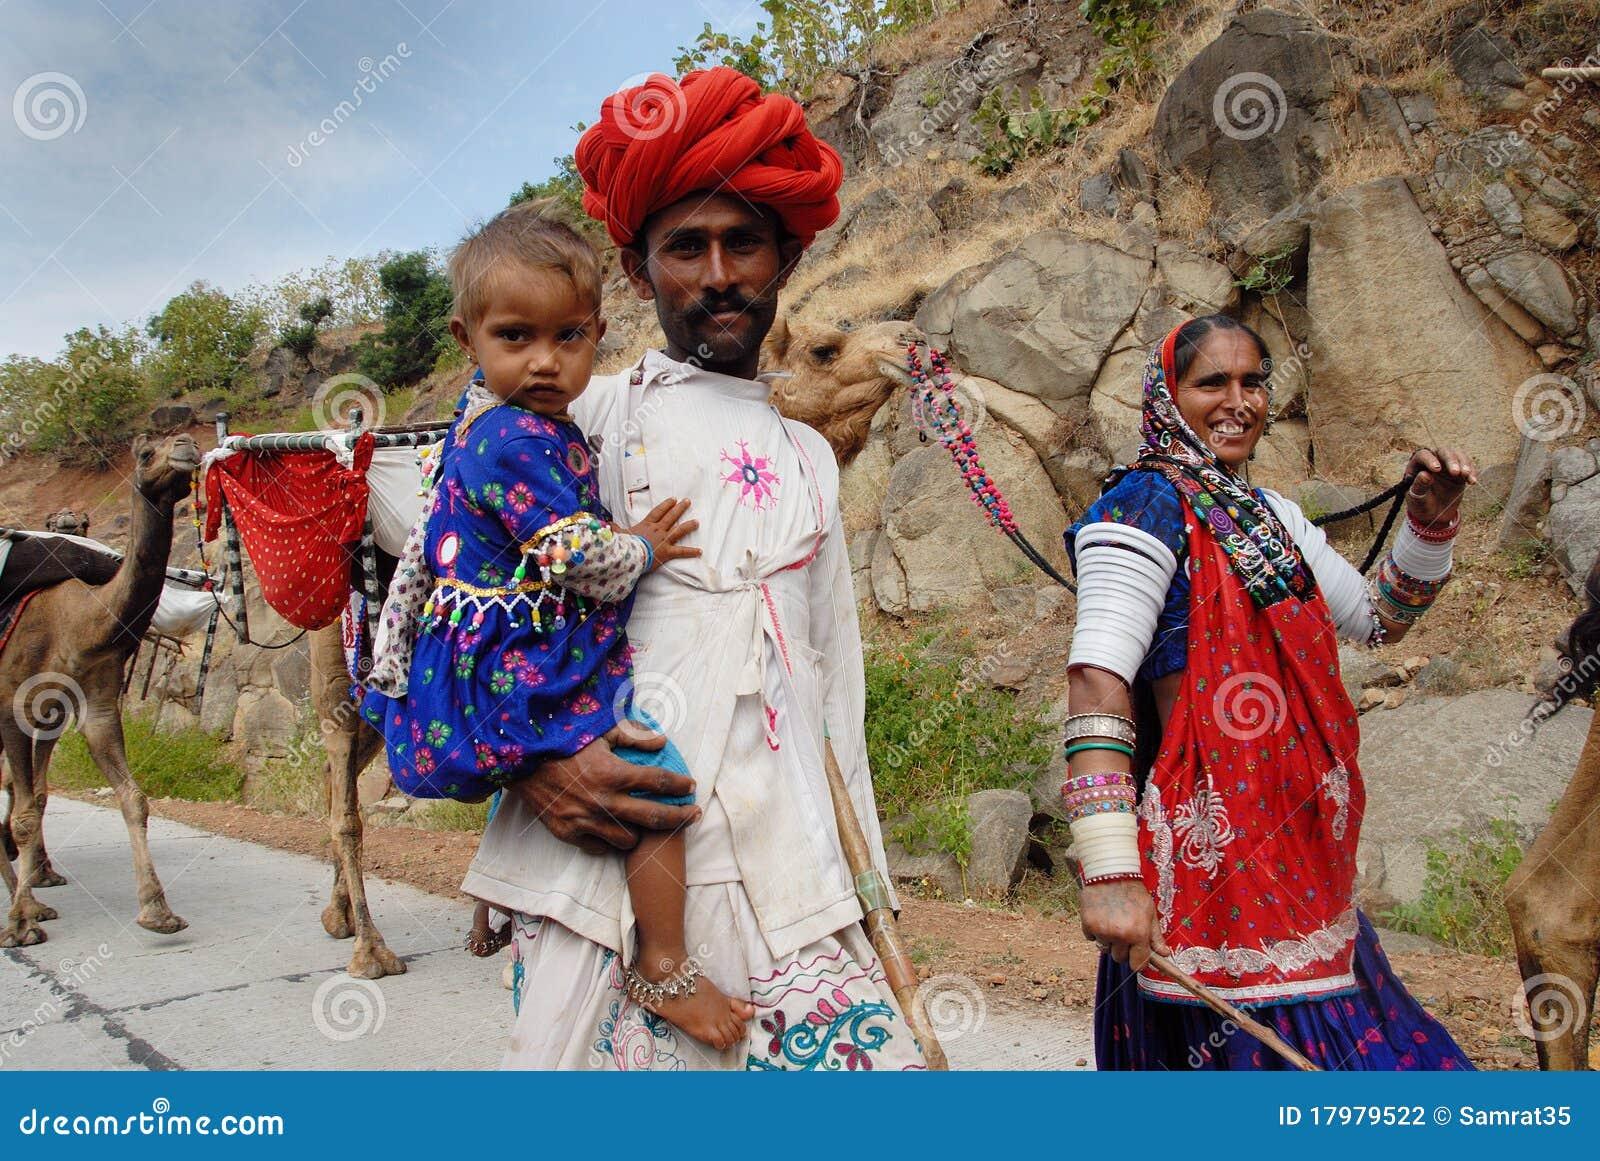 Banjara Tribes in India